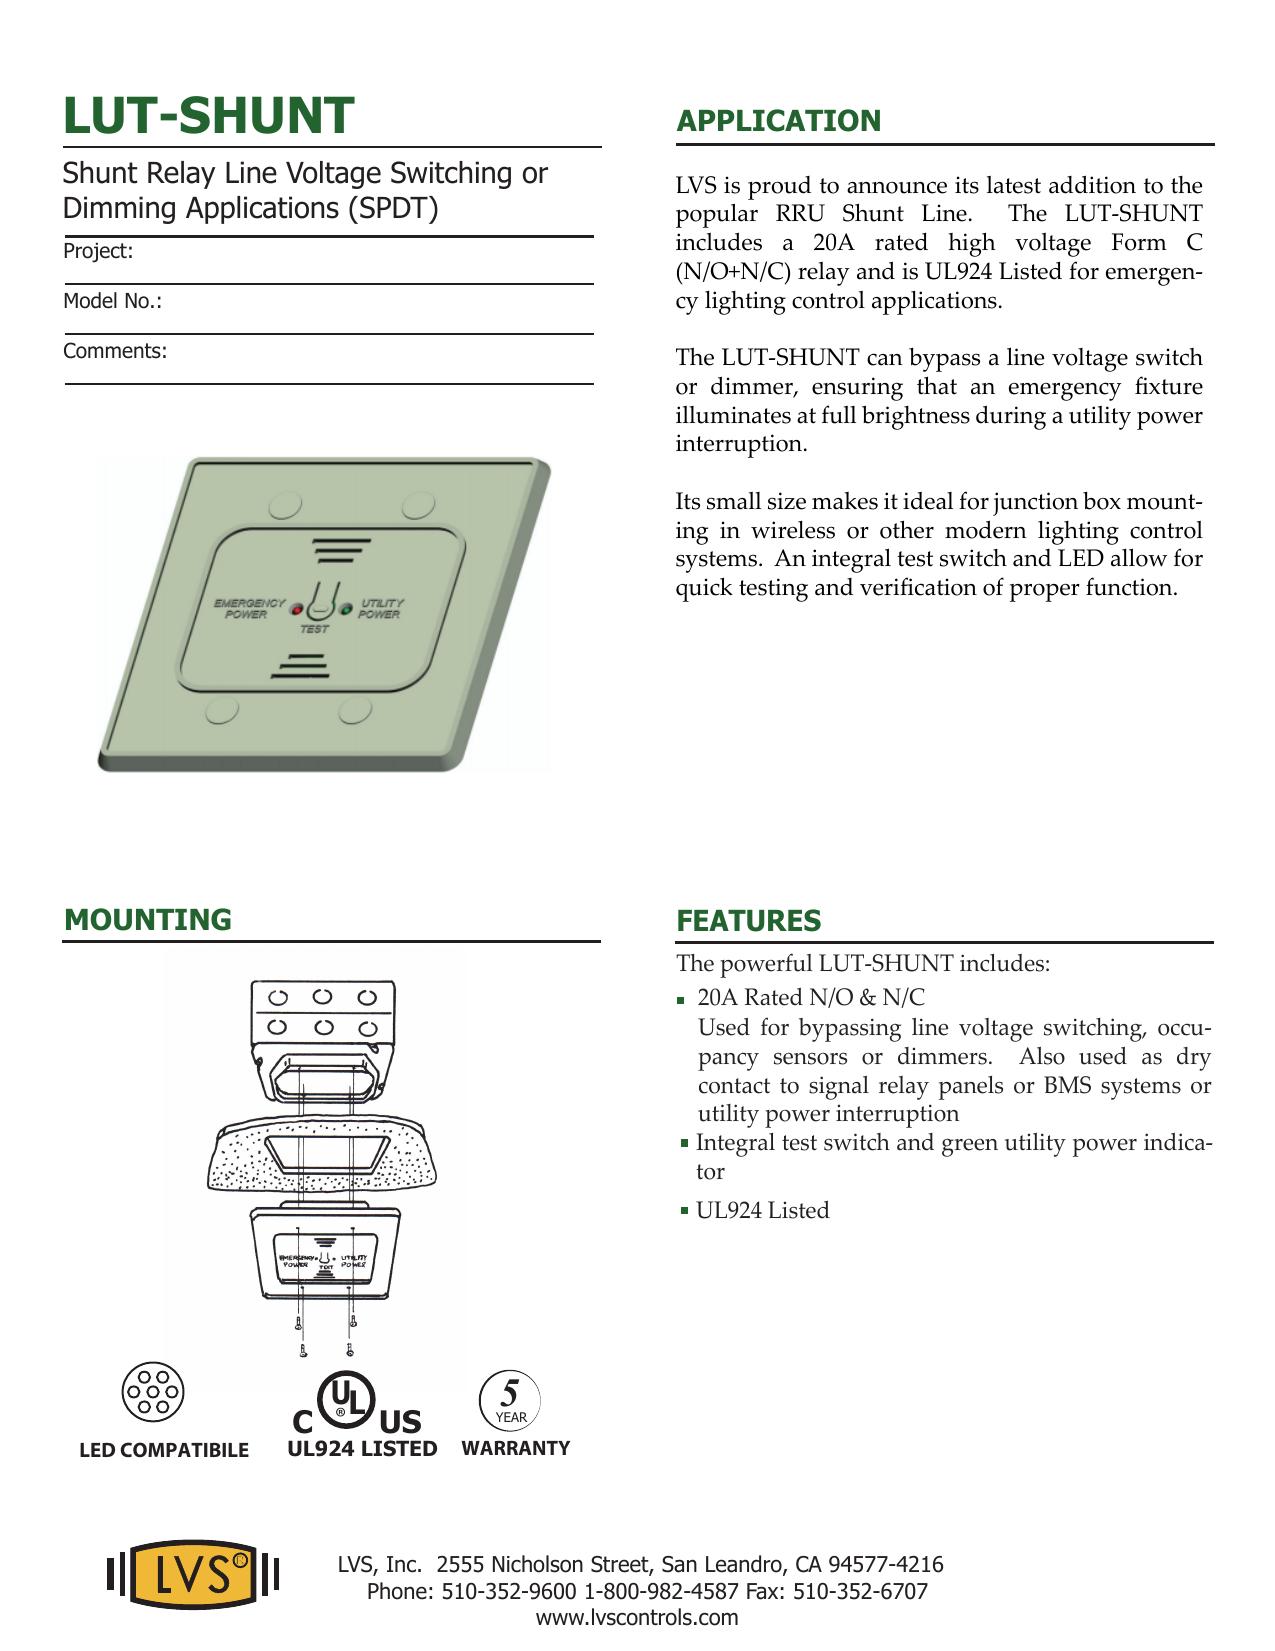 lut-shunt - LVS Controls | manualzz.com on ul 924 transfer relay, rib relay diagram, ul 924 bypass relay,